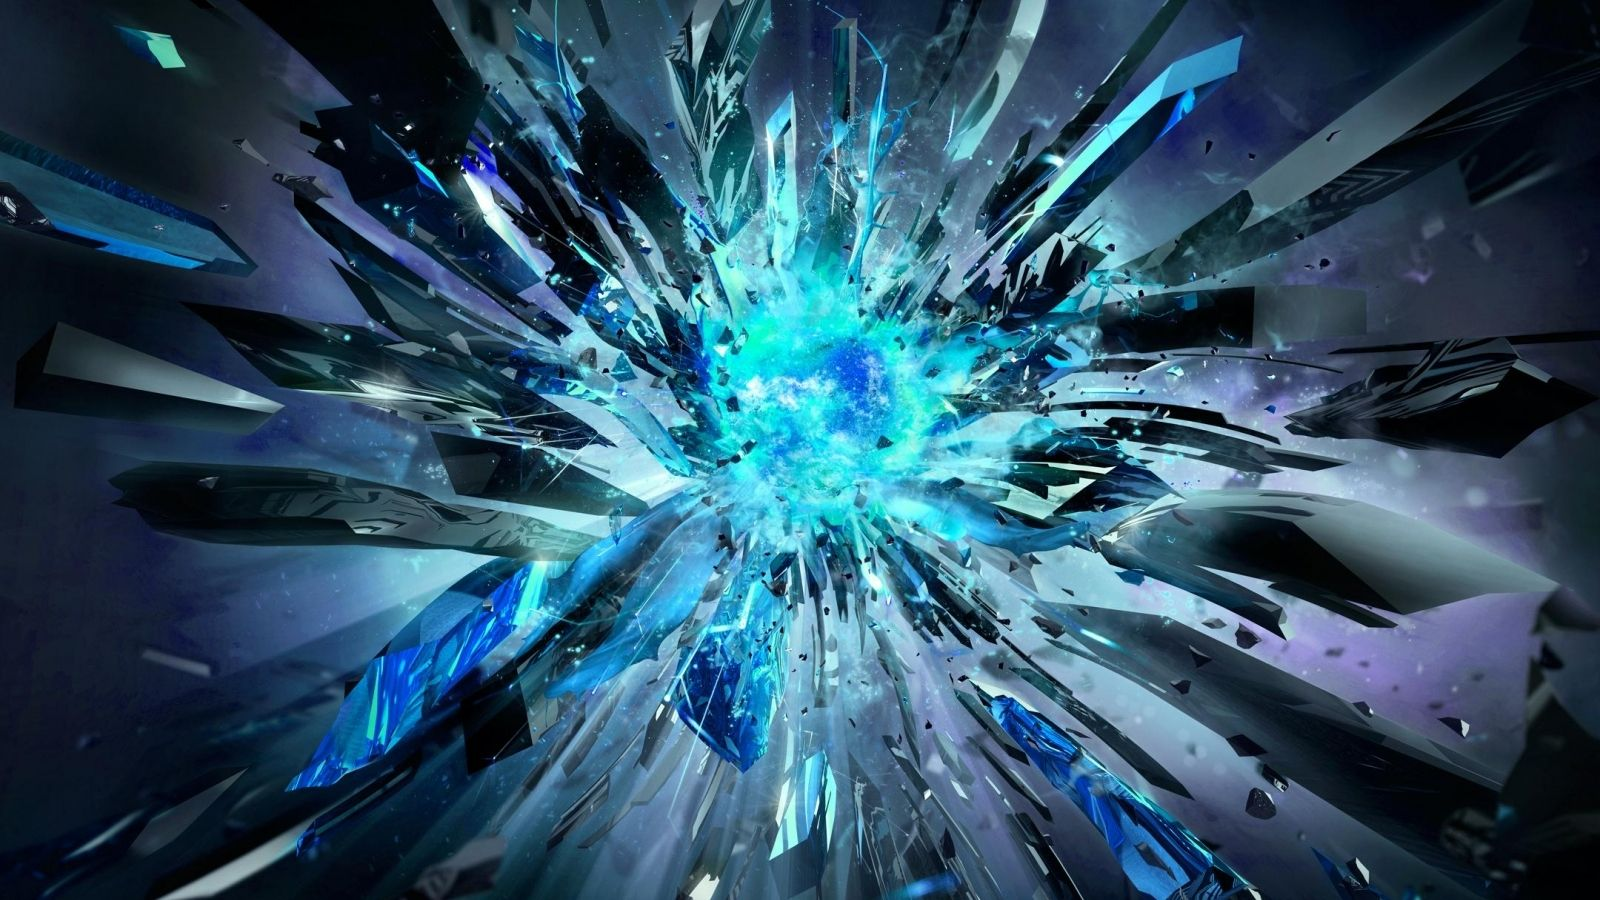 Blue Background Explosion